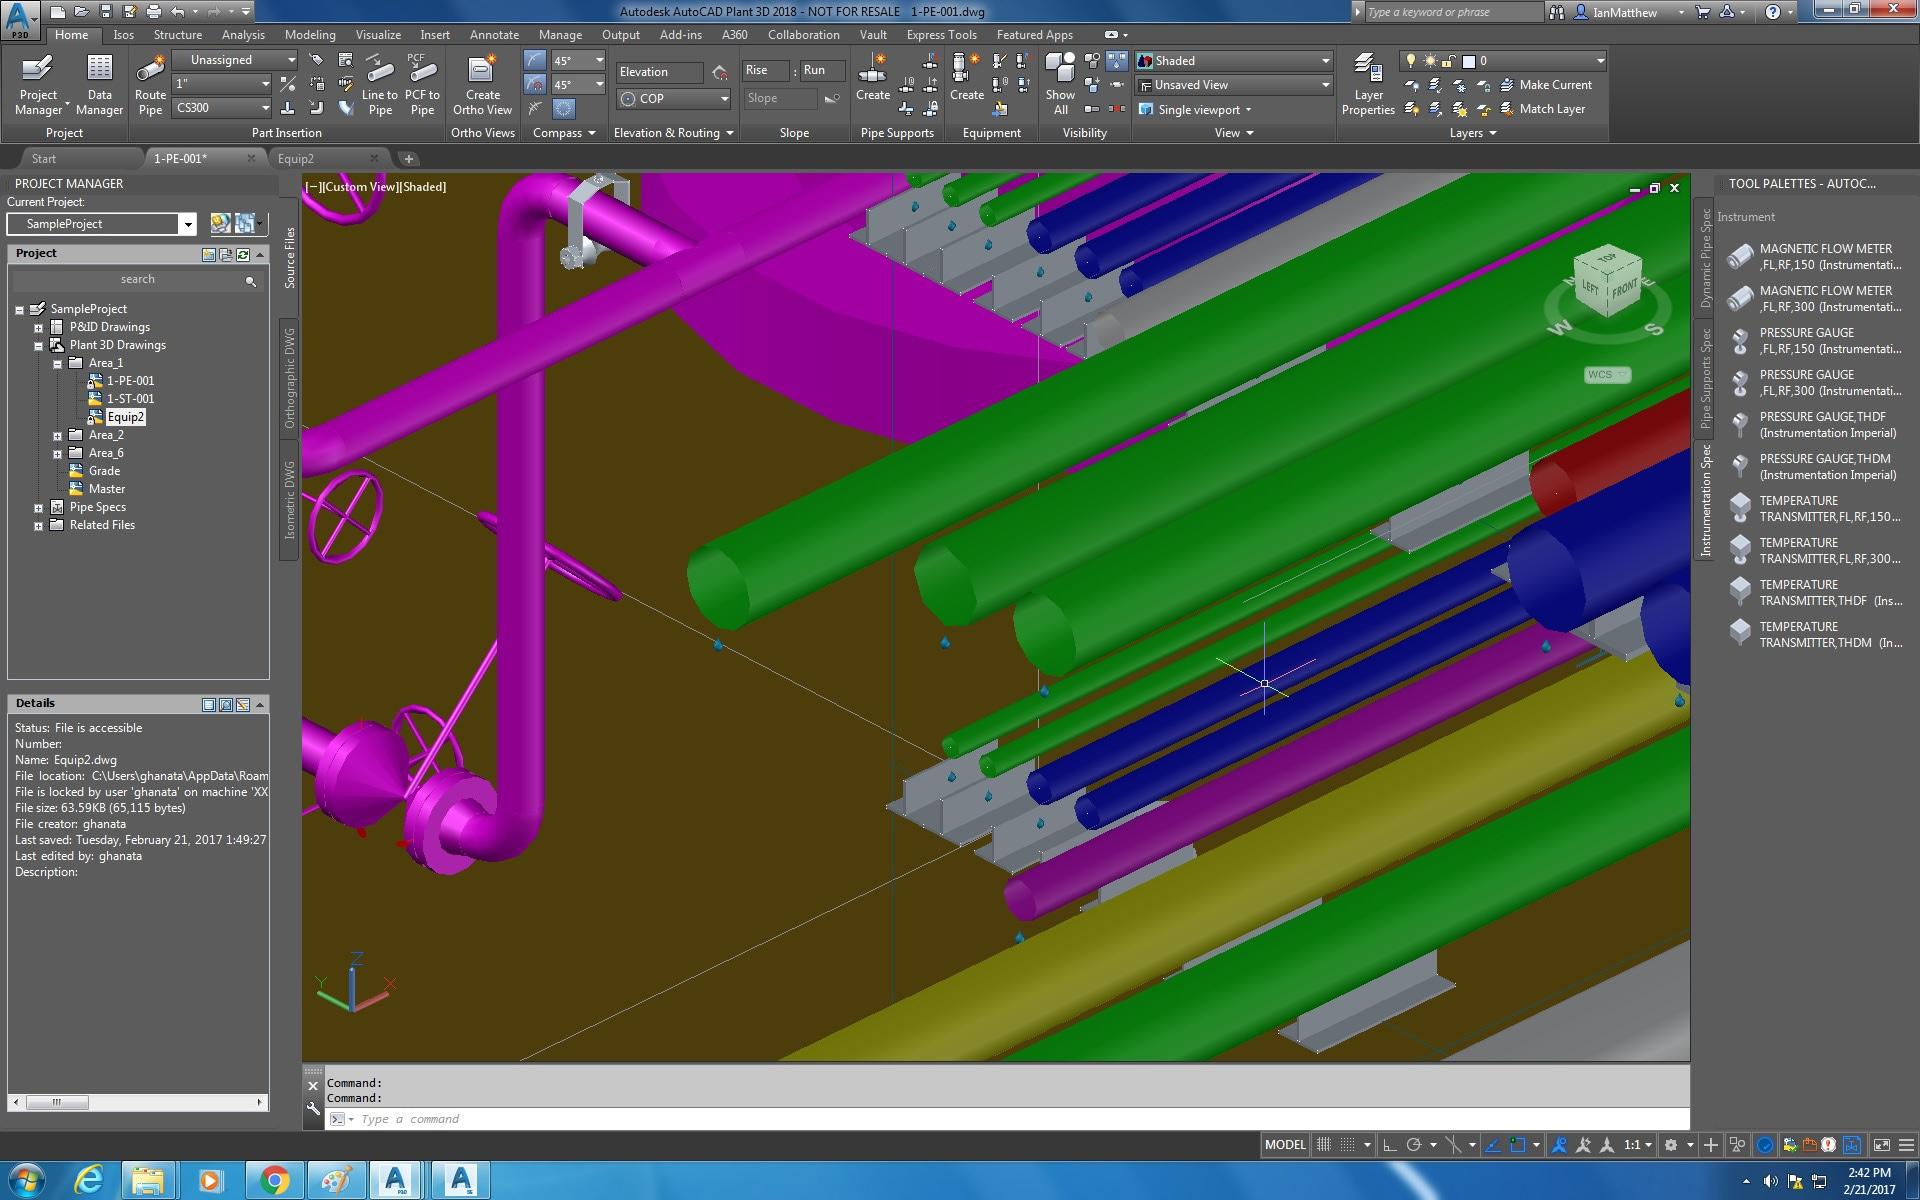 The AutoCAD Plant 3D Toolset Includes Speedy 3D Graphics